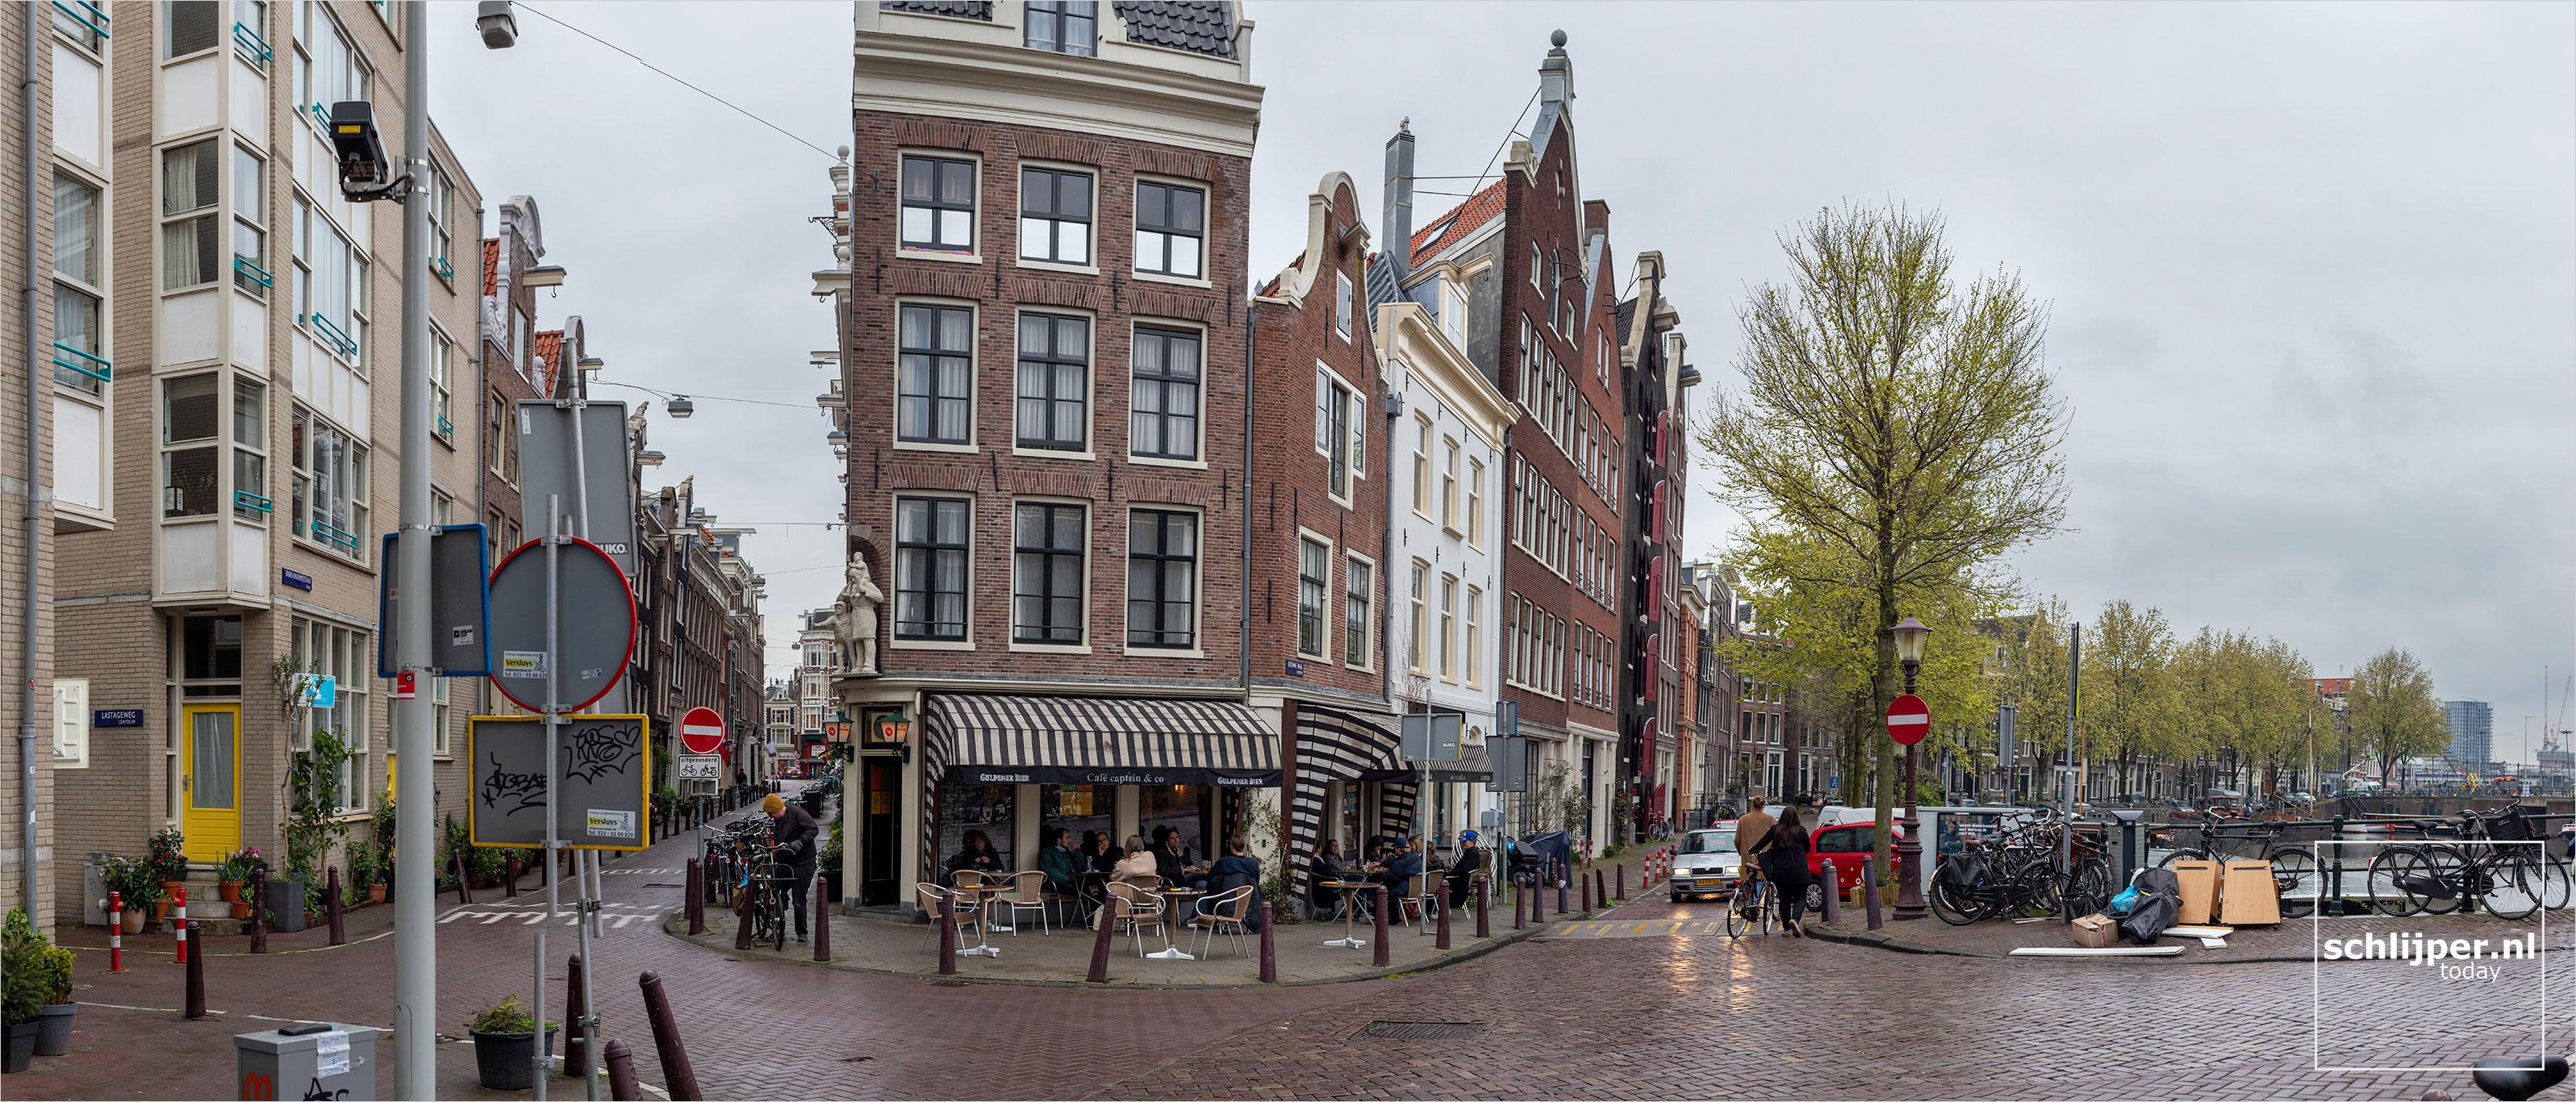 The Netherlands, Amsterdam, 30 april 2021